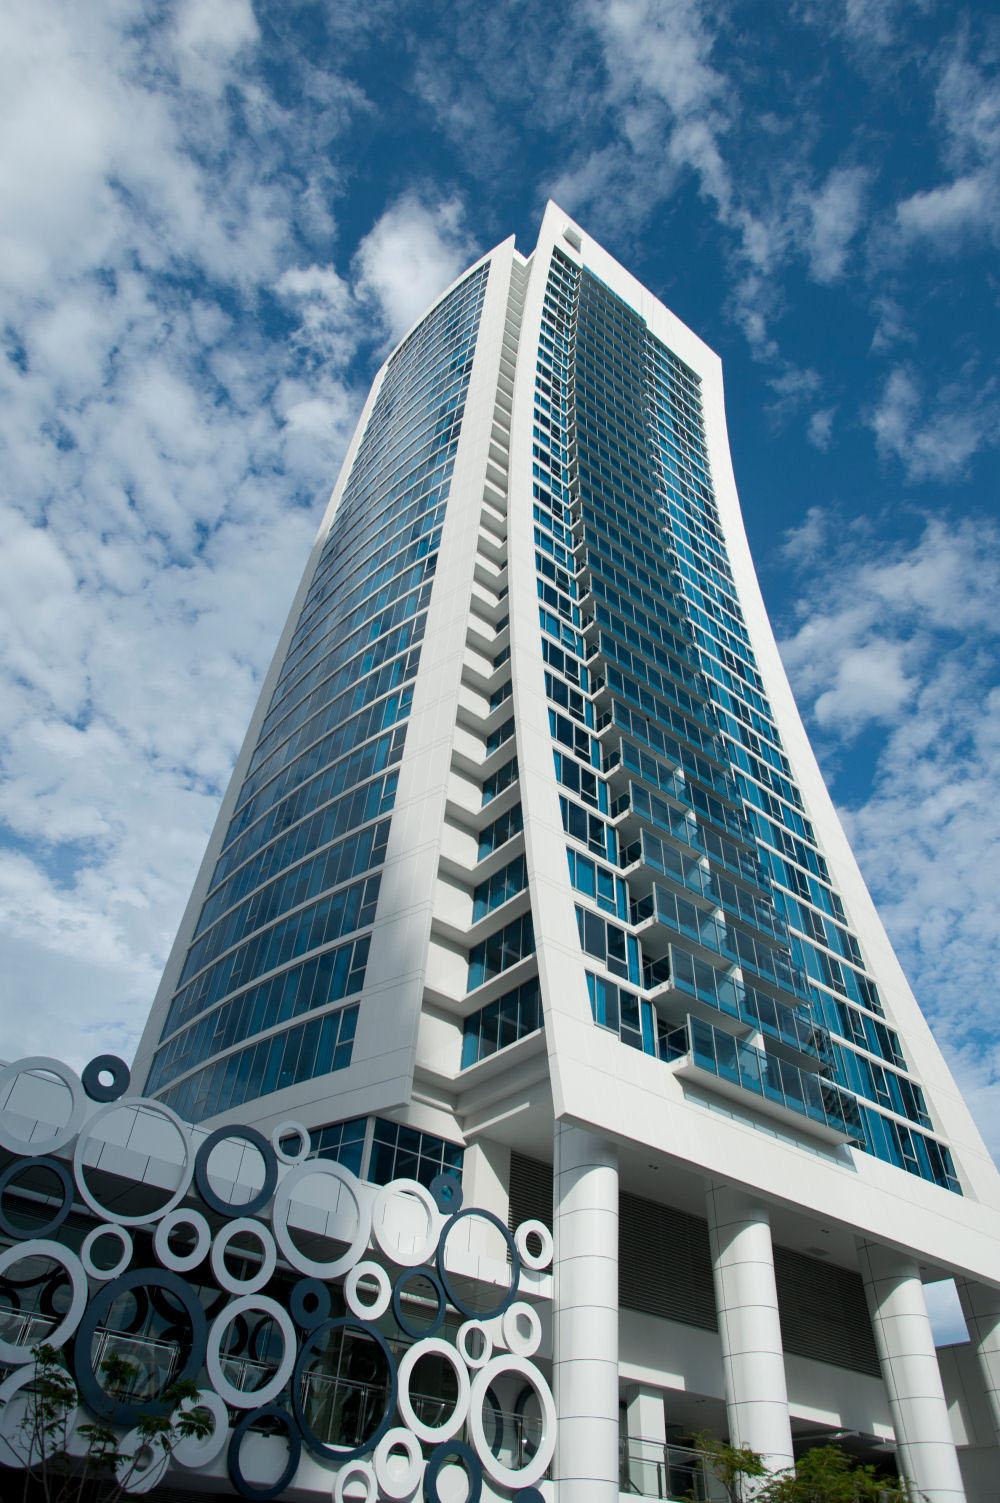 Hilton surfers paradise in gold coast queensland for Design hotel australia